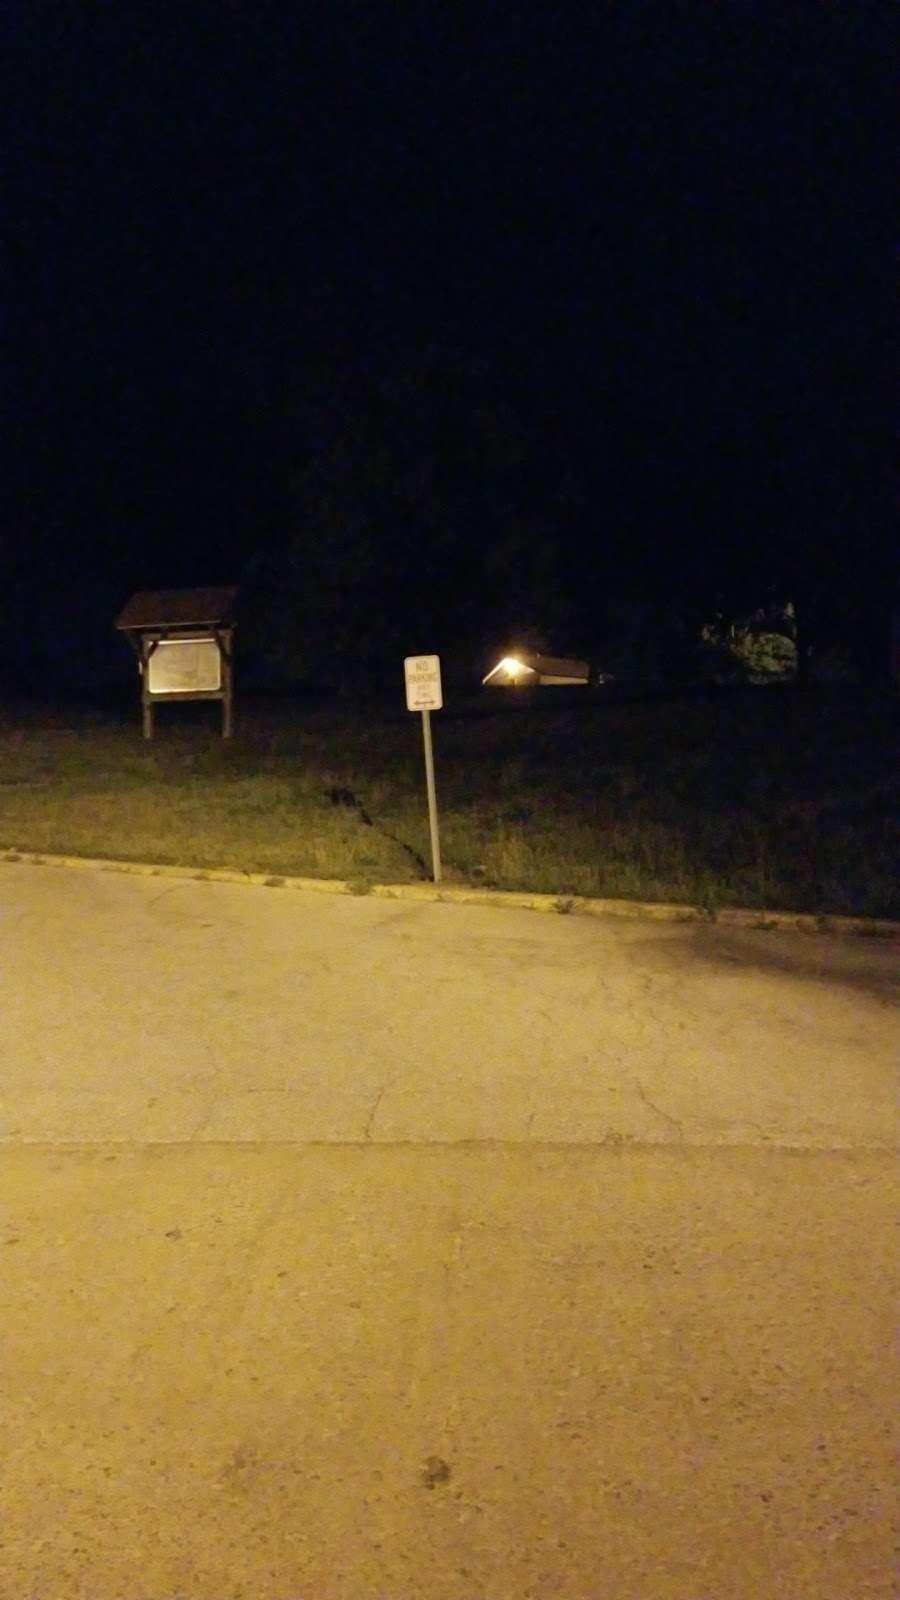 Lake Jacomo Shelter - park  | Photo 6 of 7 | Address: 7401 W Park Rd, Blue Springs, MO 64015, USA | Phone: (816) 795-8888